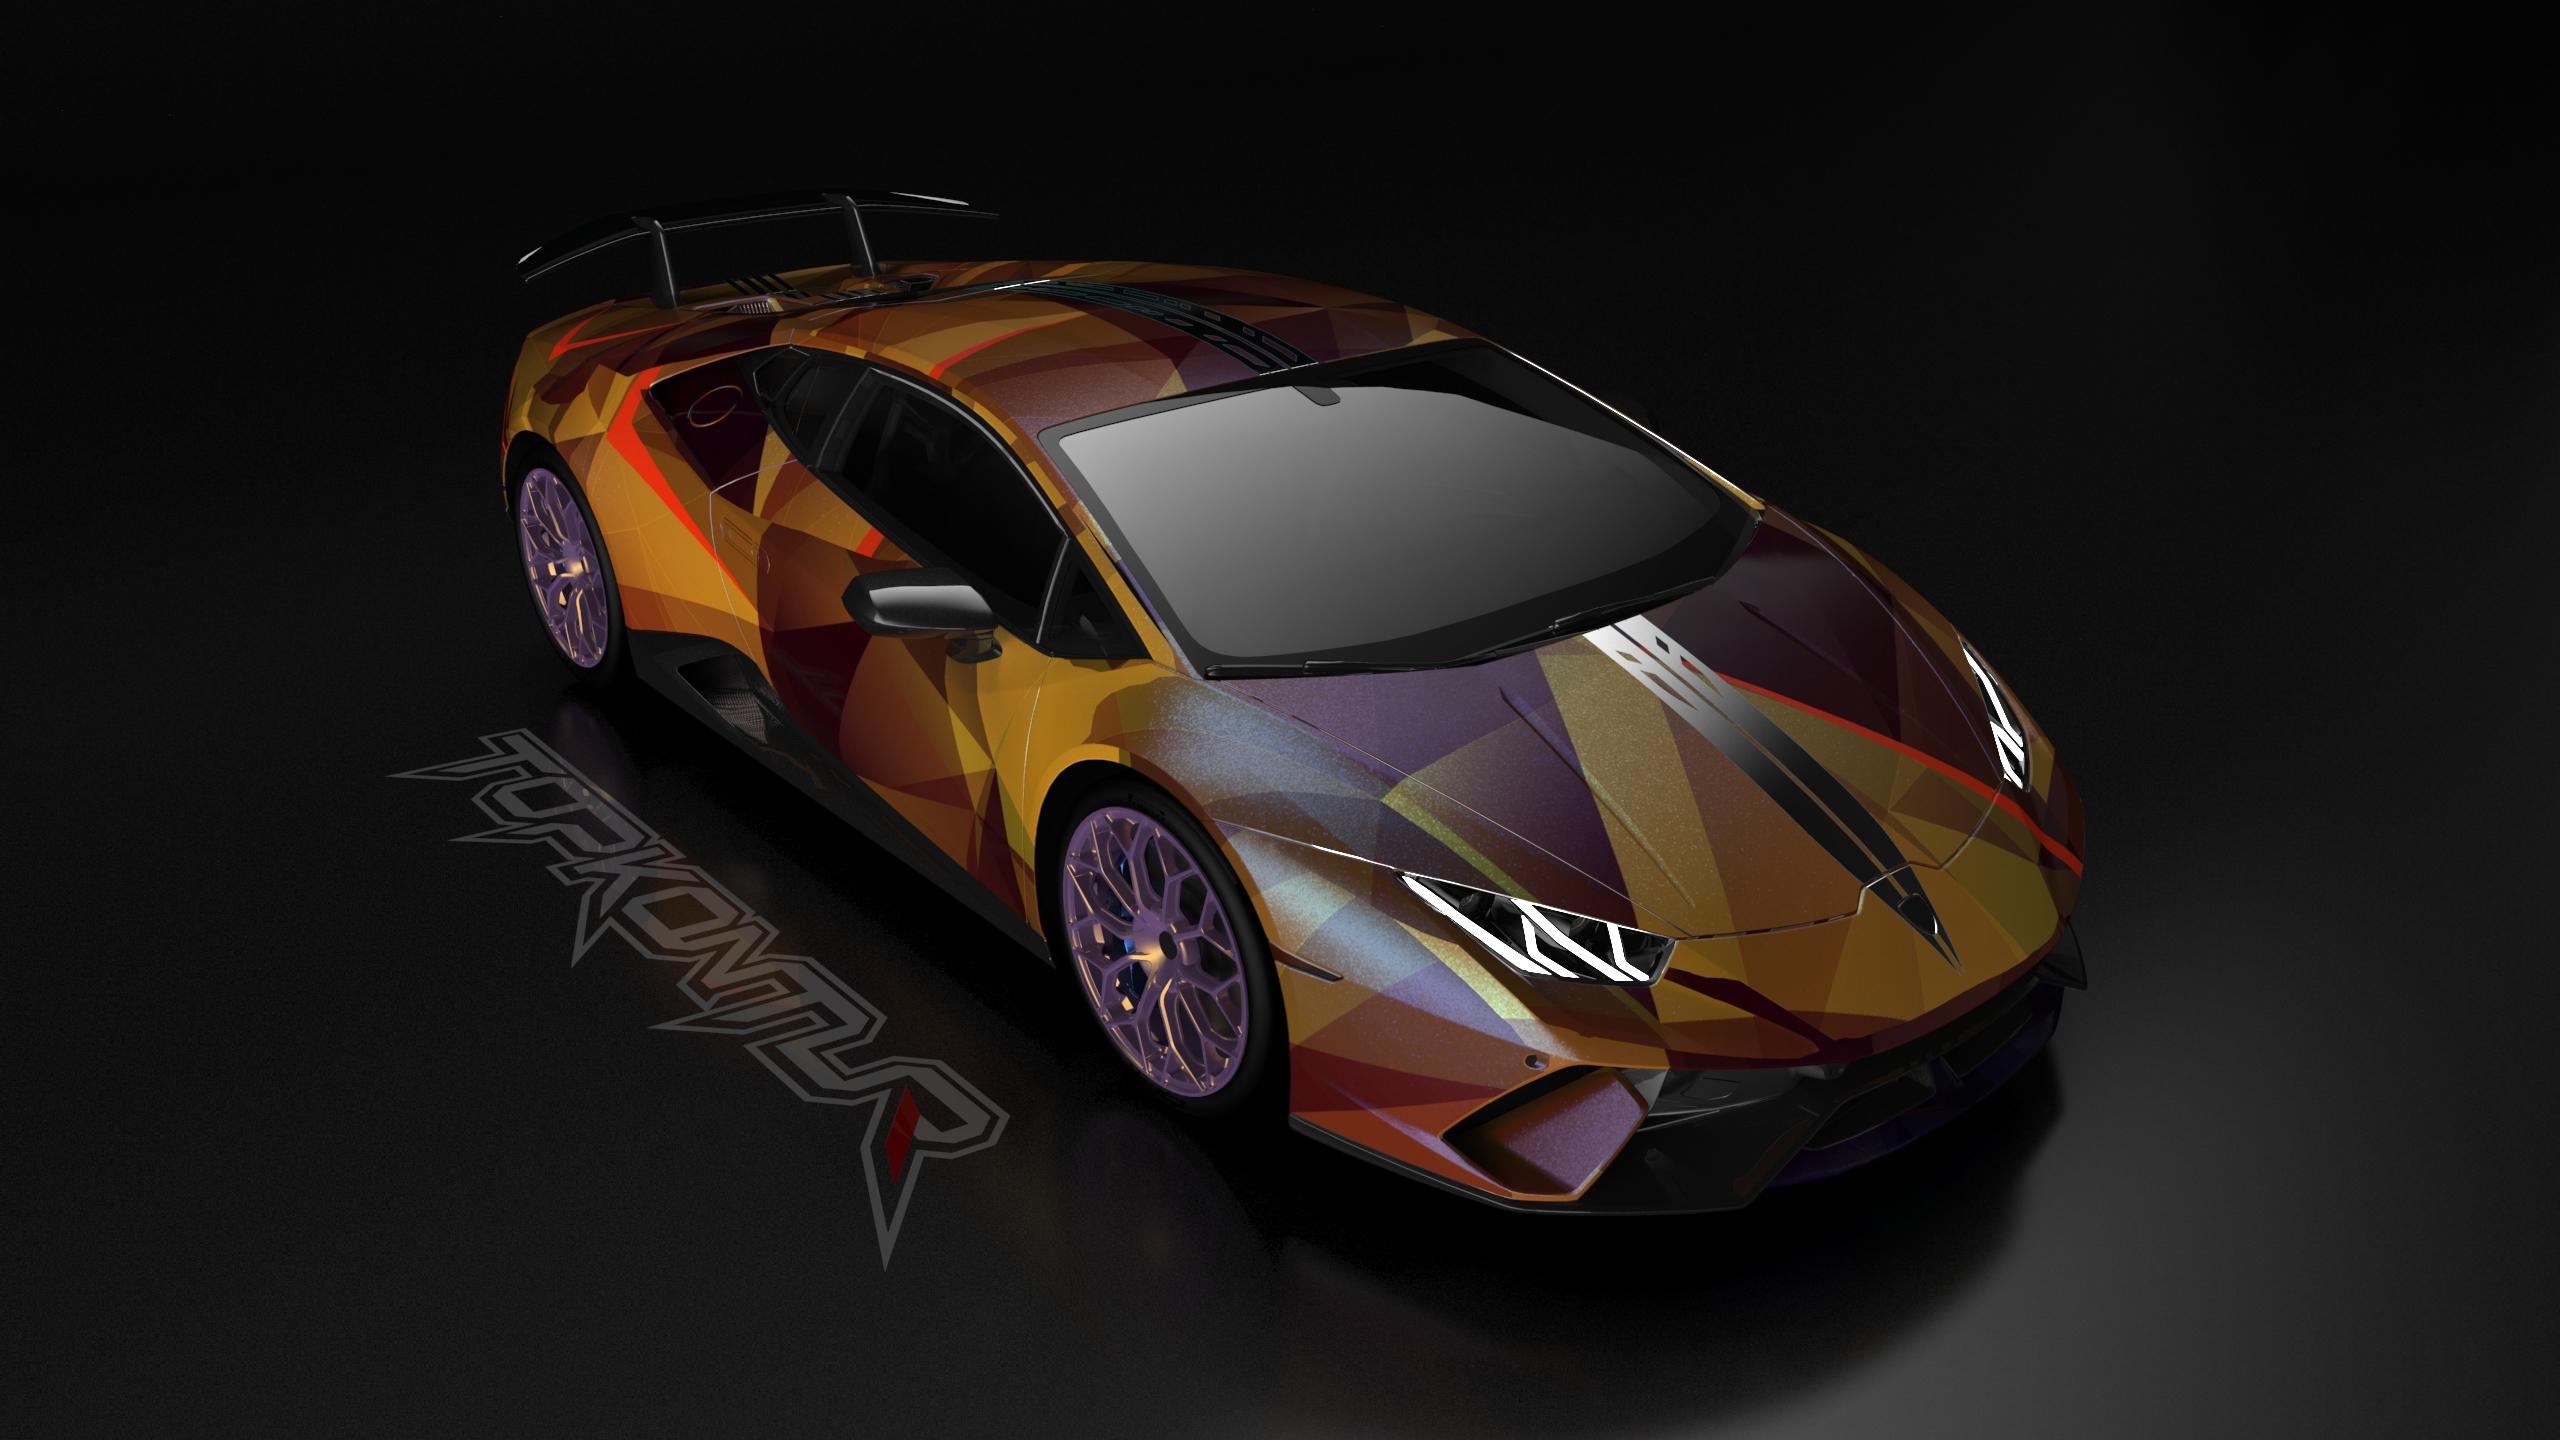 Gold And Wine Lamborghini Huracan Hd Cars 4k Wallpapers Images